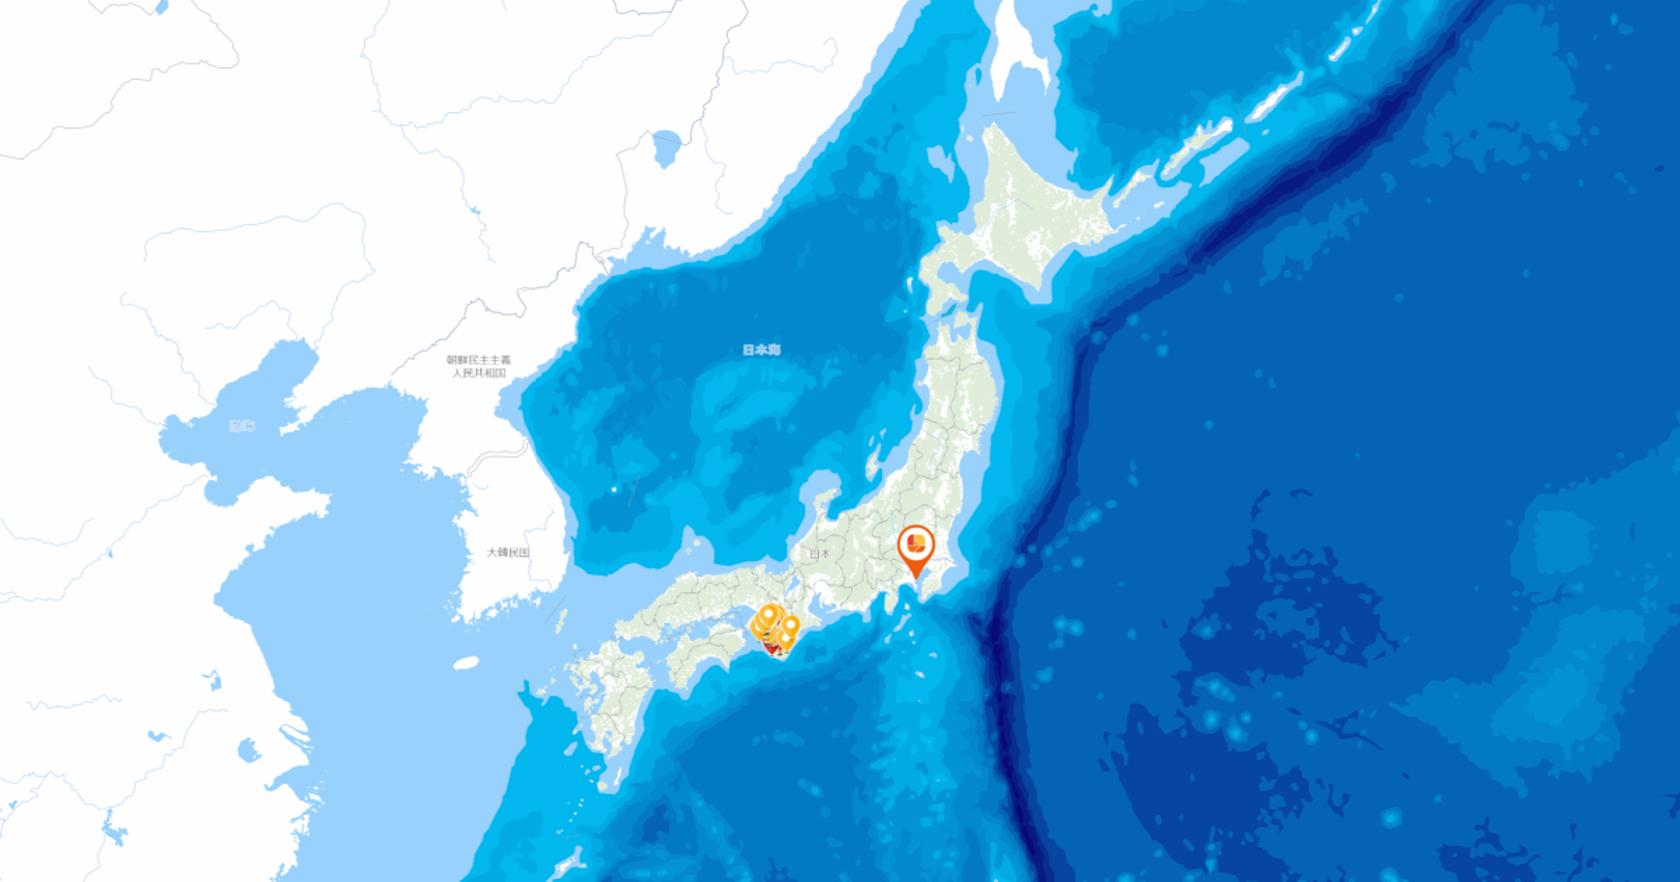 Geolonia Maps